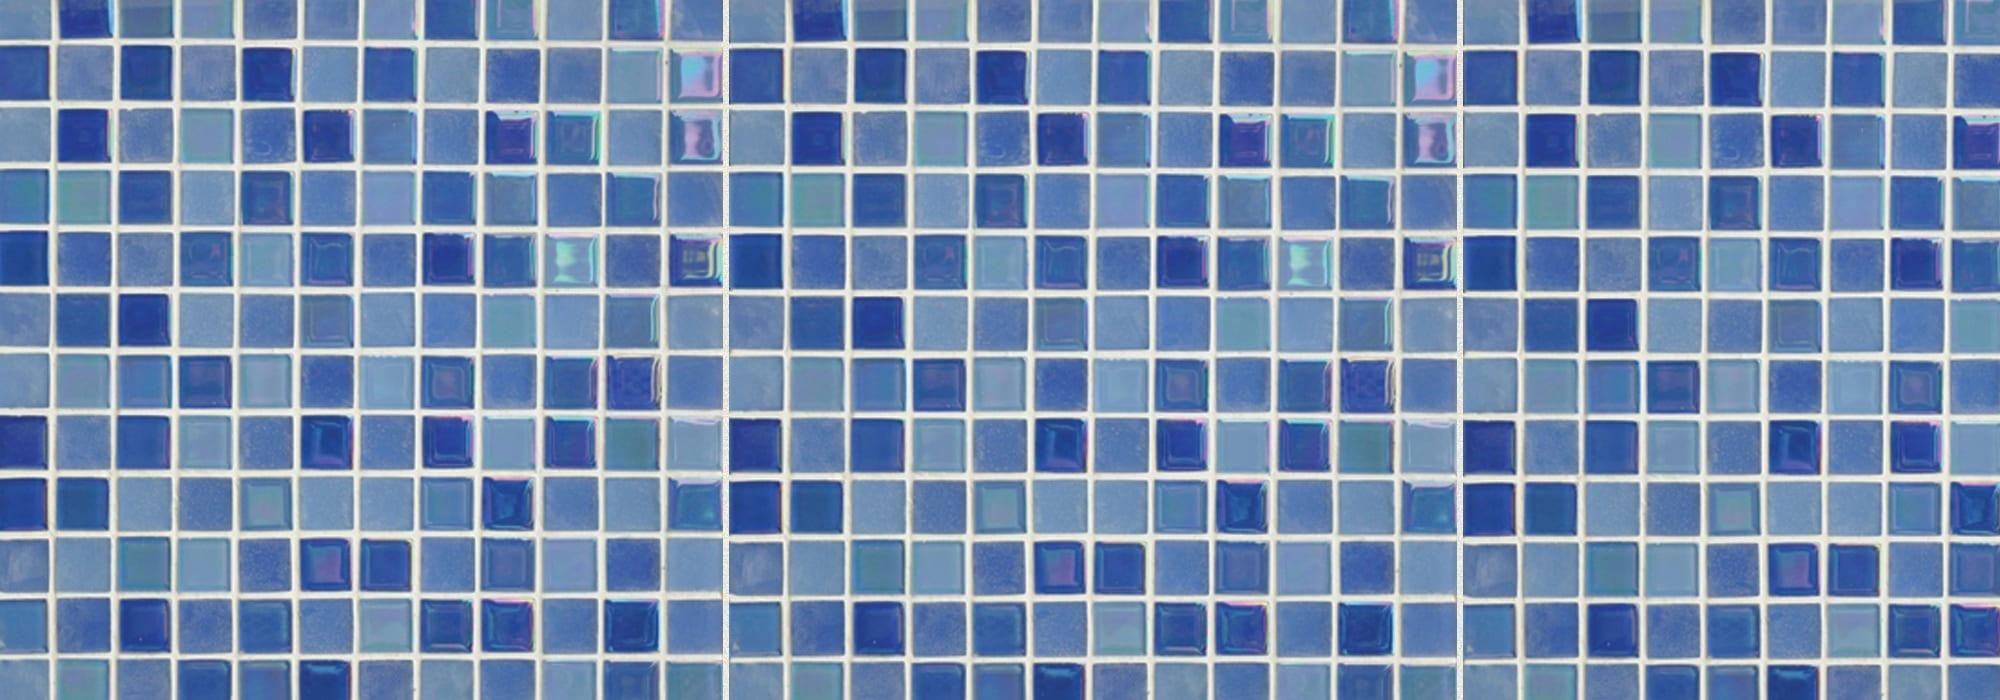 פסיפס זכוכית מרין by Milstone